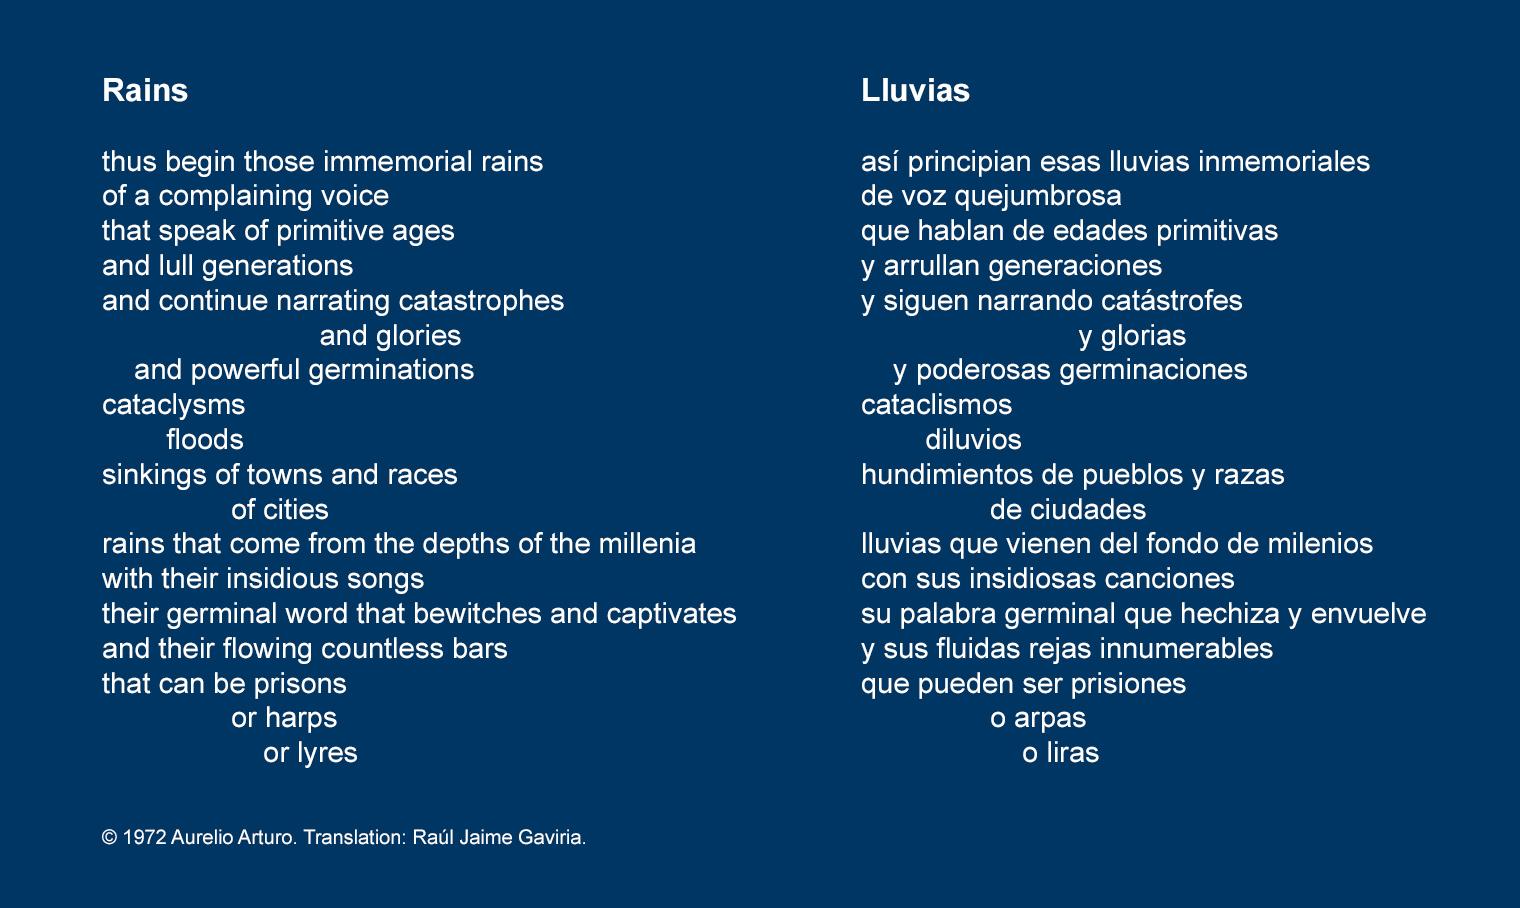 "Snippet of ""Rains"" poem by Aurelio Arturo in English & Spanish. See full poem here: http://www.poetryinternationalweb.net/pi/site/poem/item/1335/auto/0/RAINS"